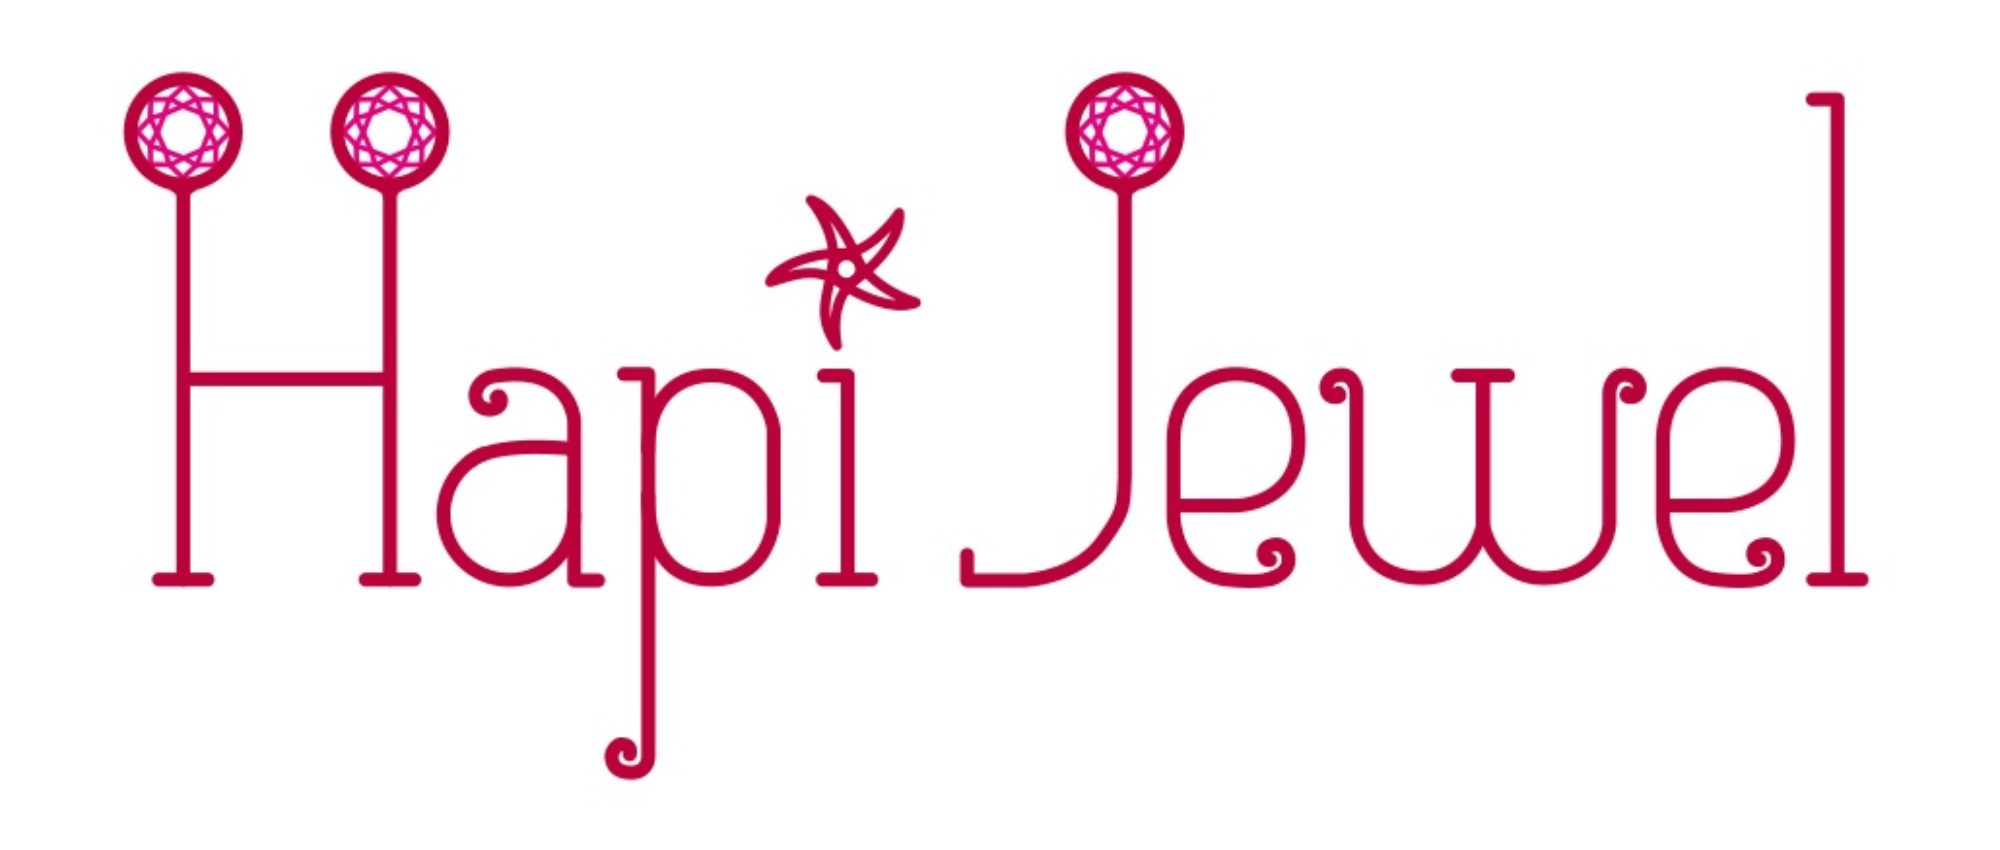 cropped-HapiJewel_logo_pink-1.jpg